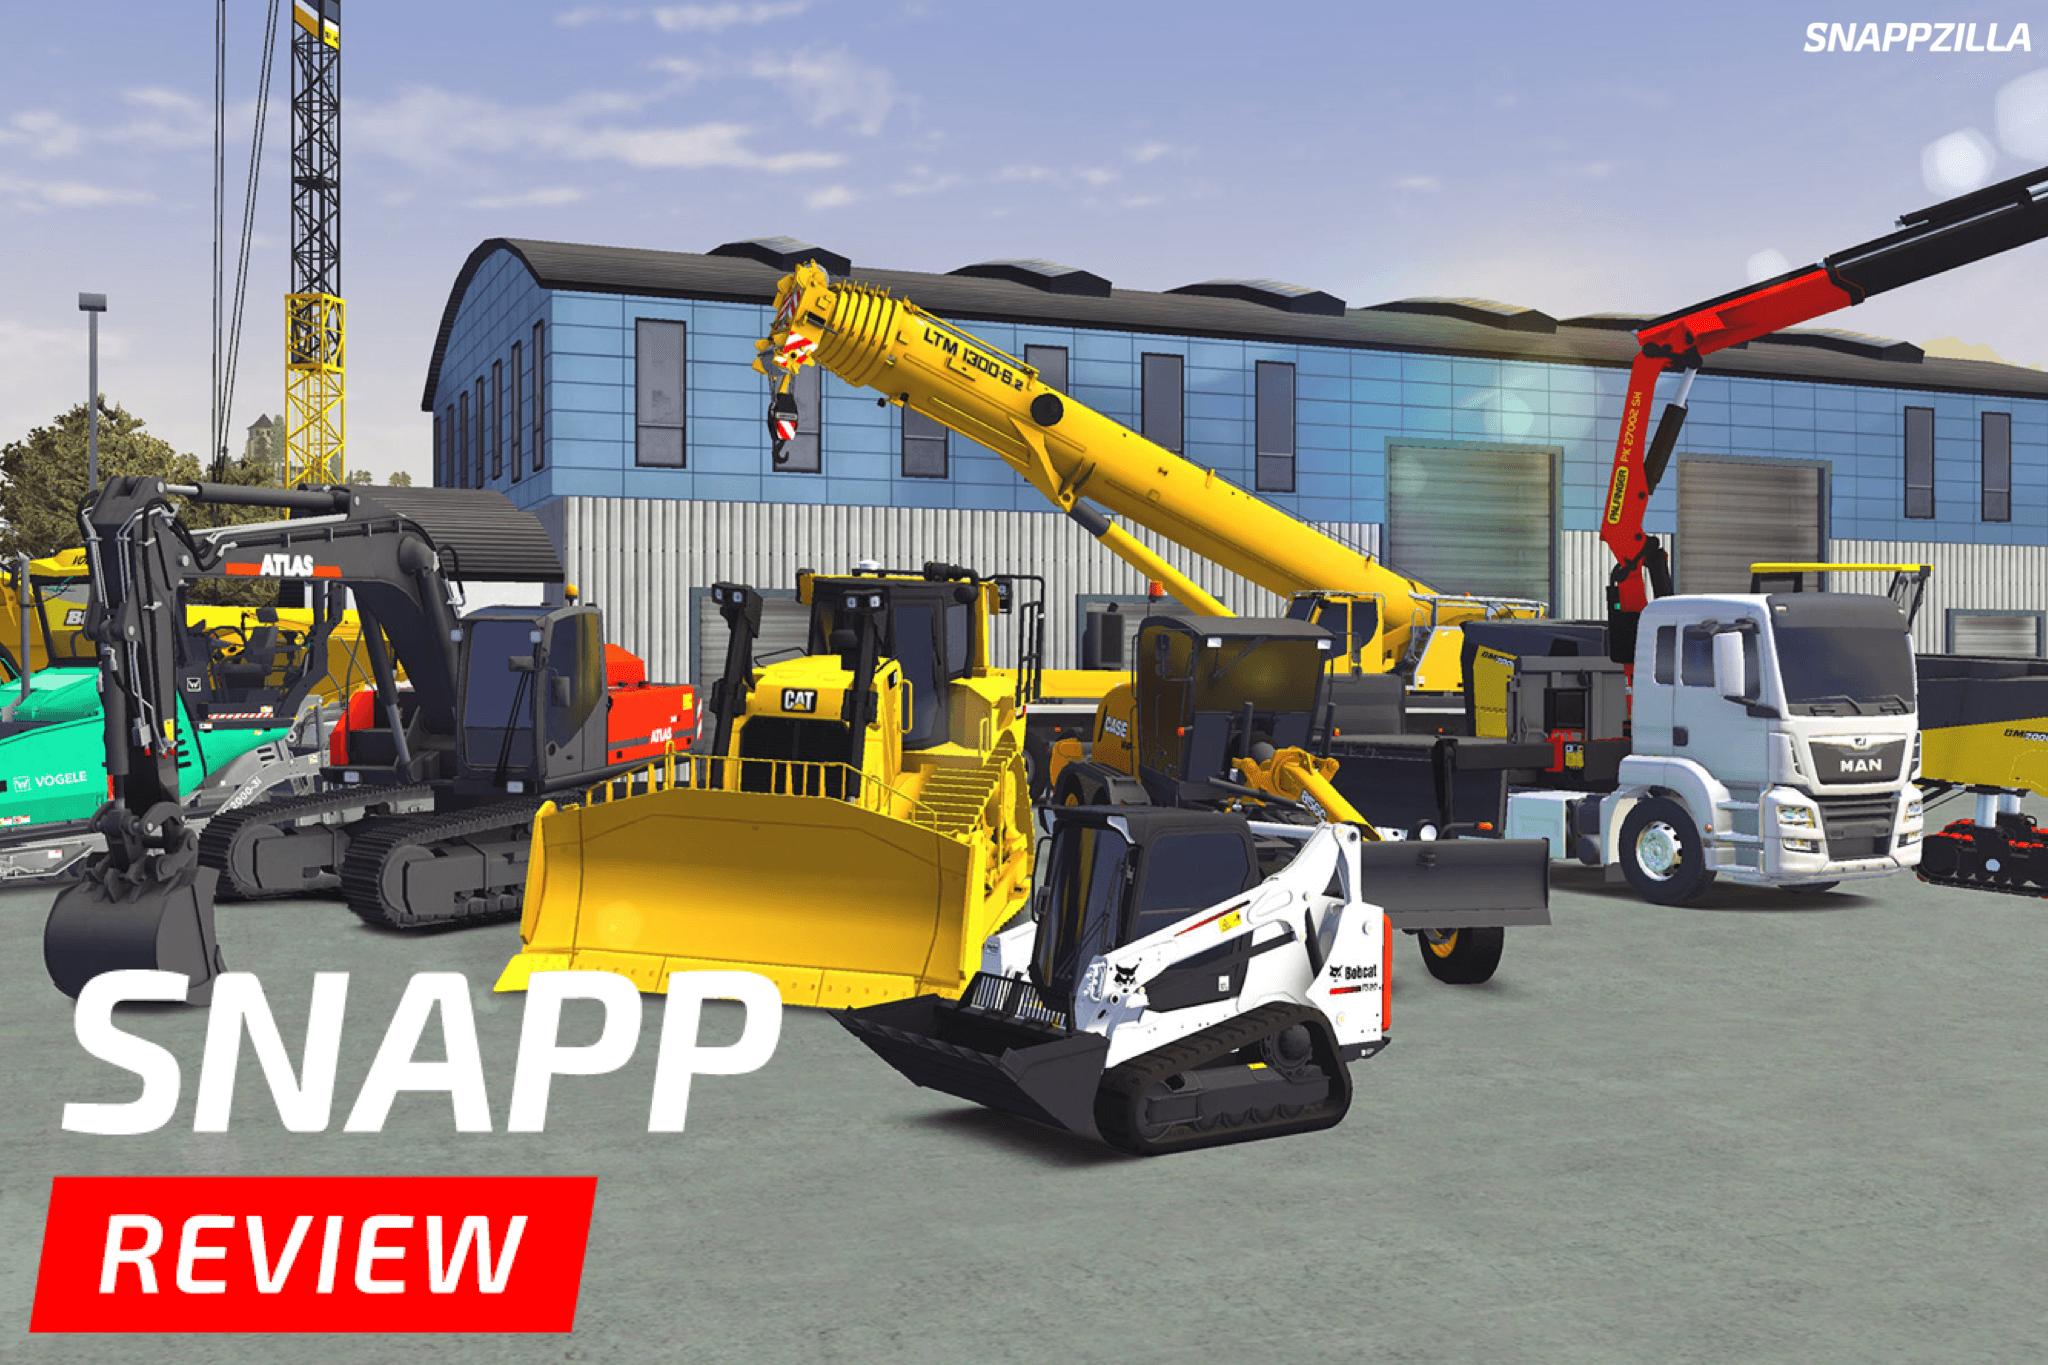 Construction Simulator 3 (SNAPP Review) - snappzilla